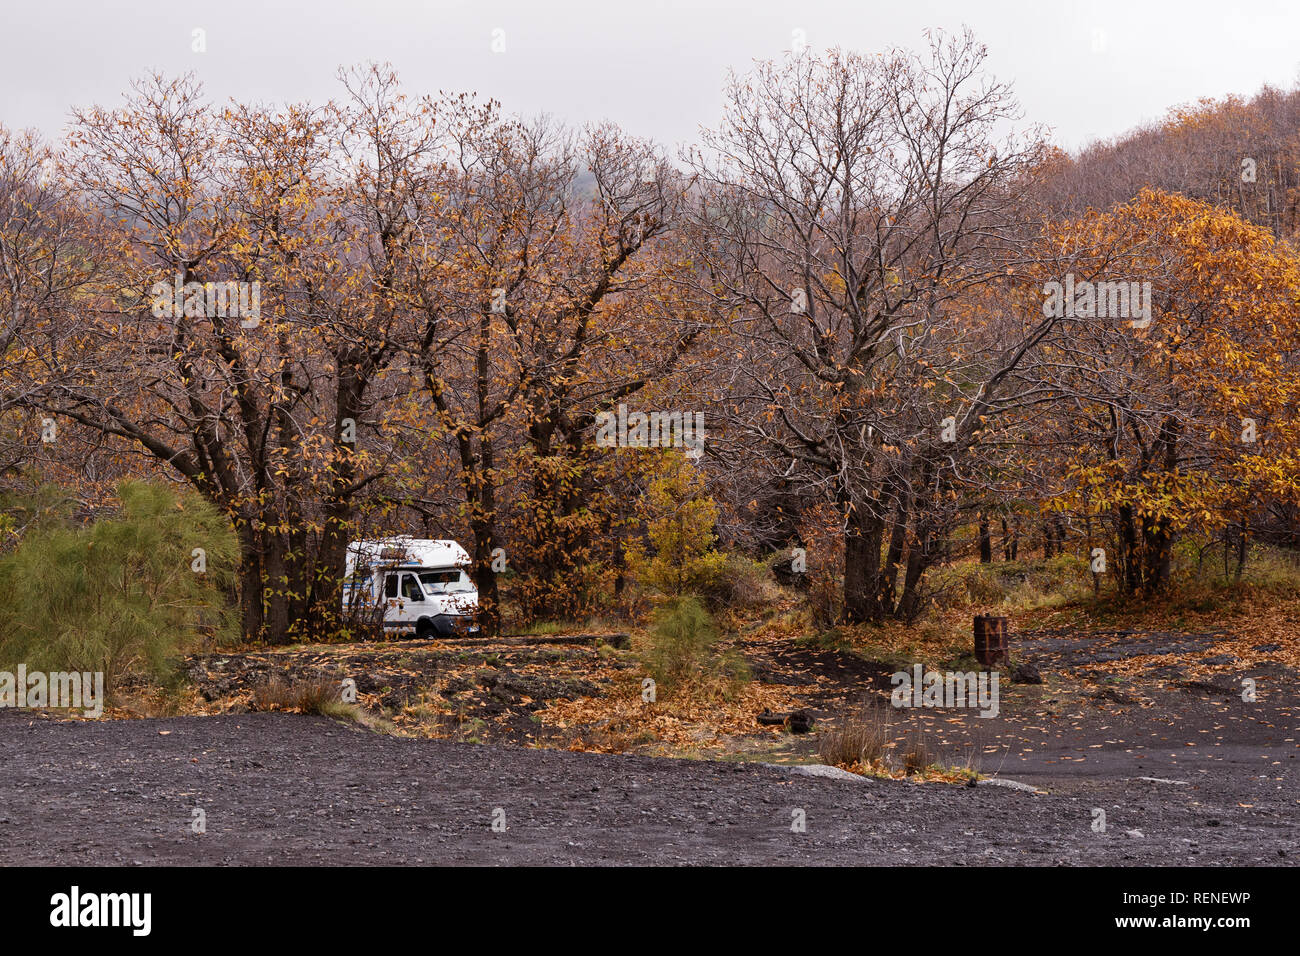 Camping Caravan Trailer Parked Hidden In Beautiful Autumn Tree